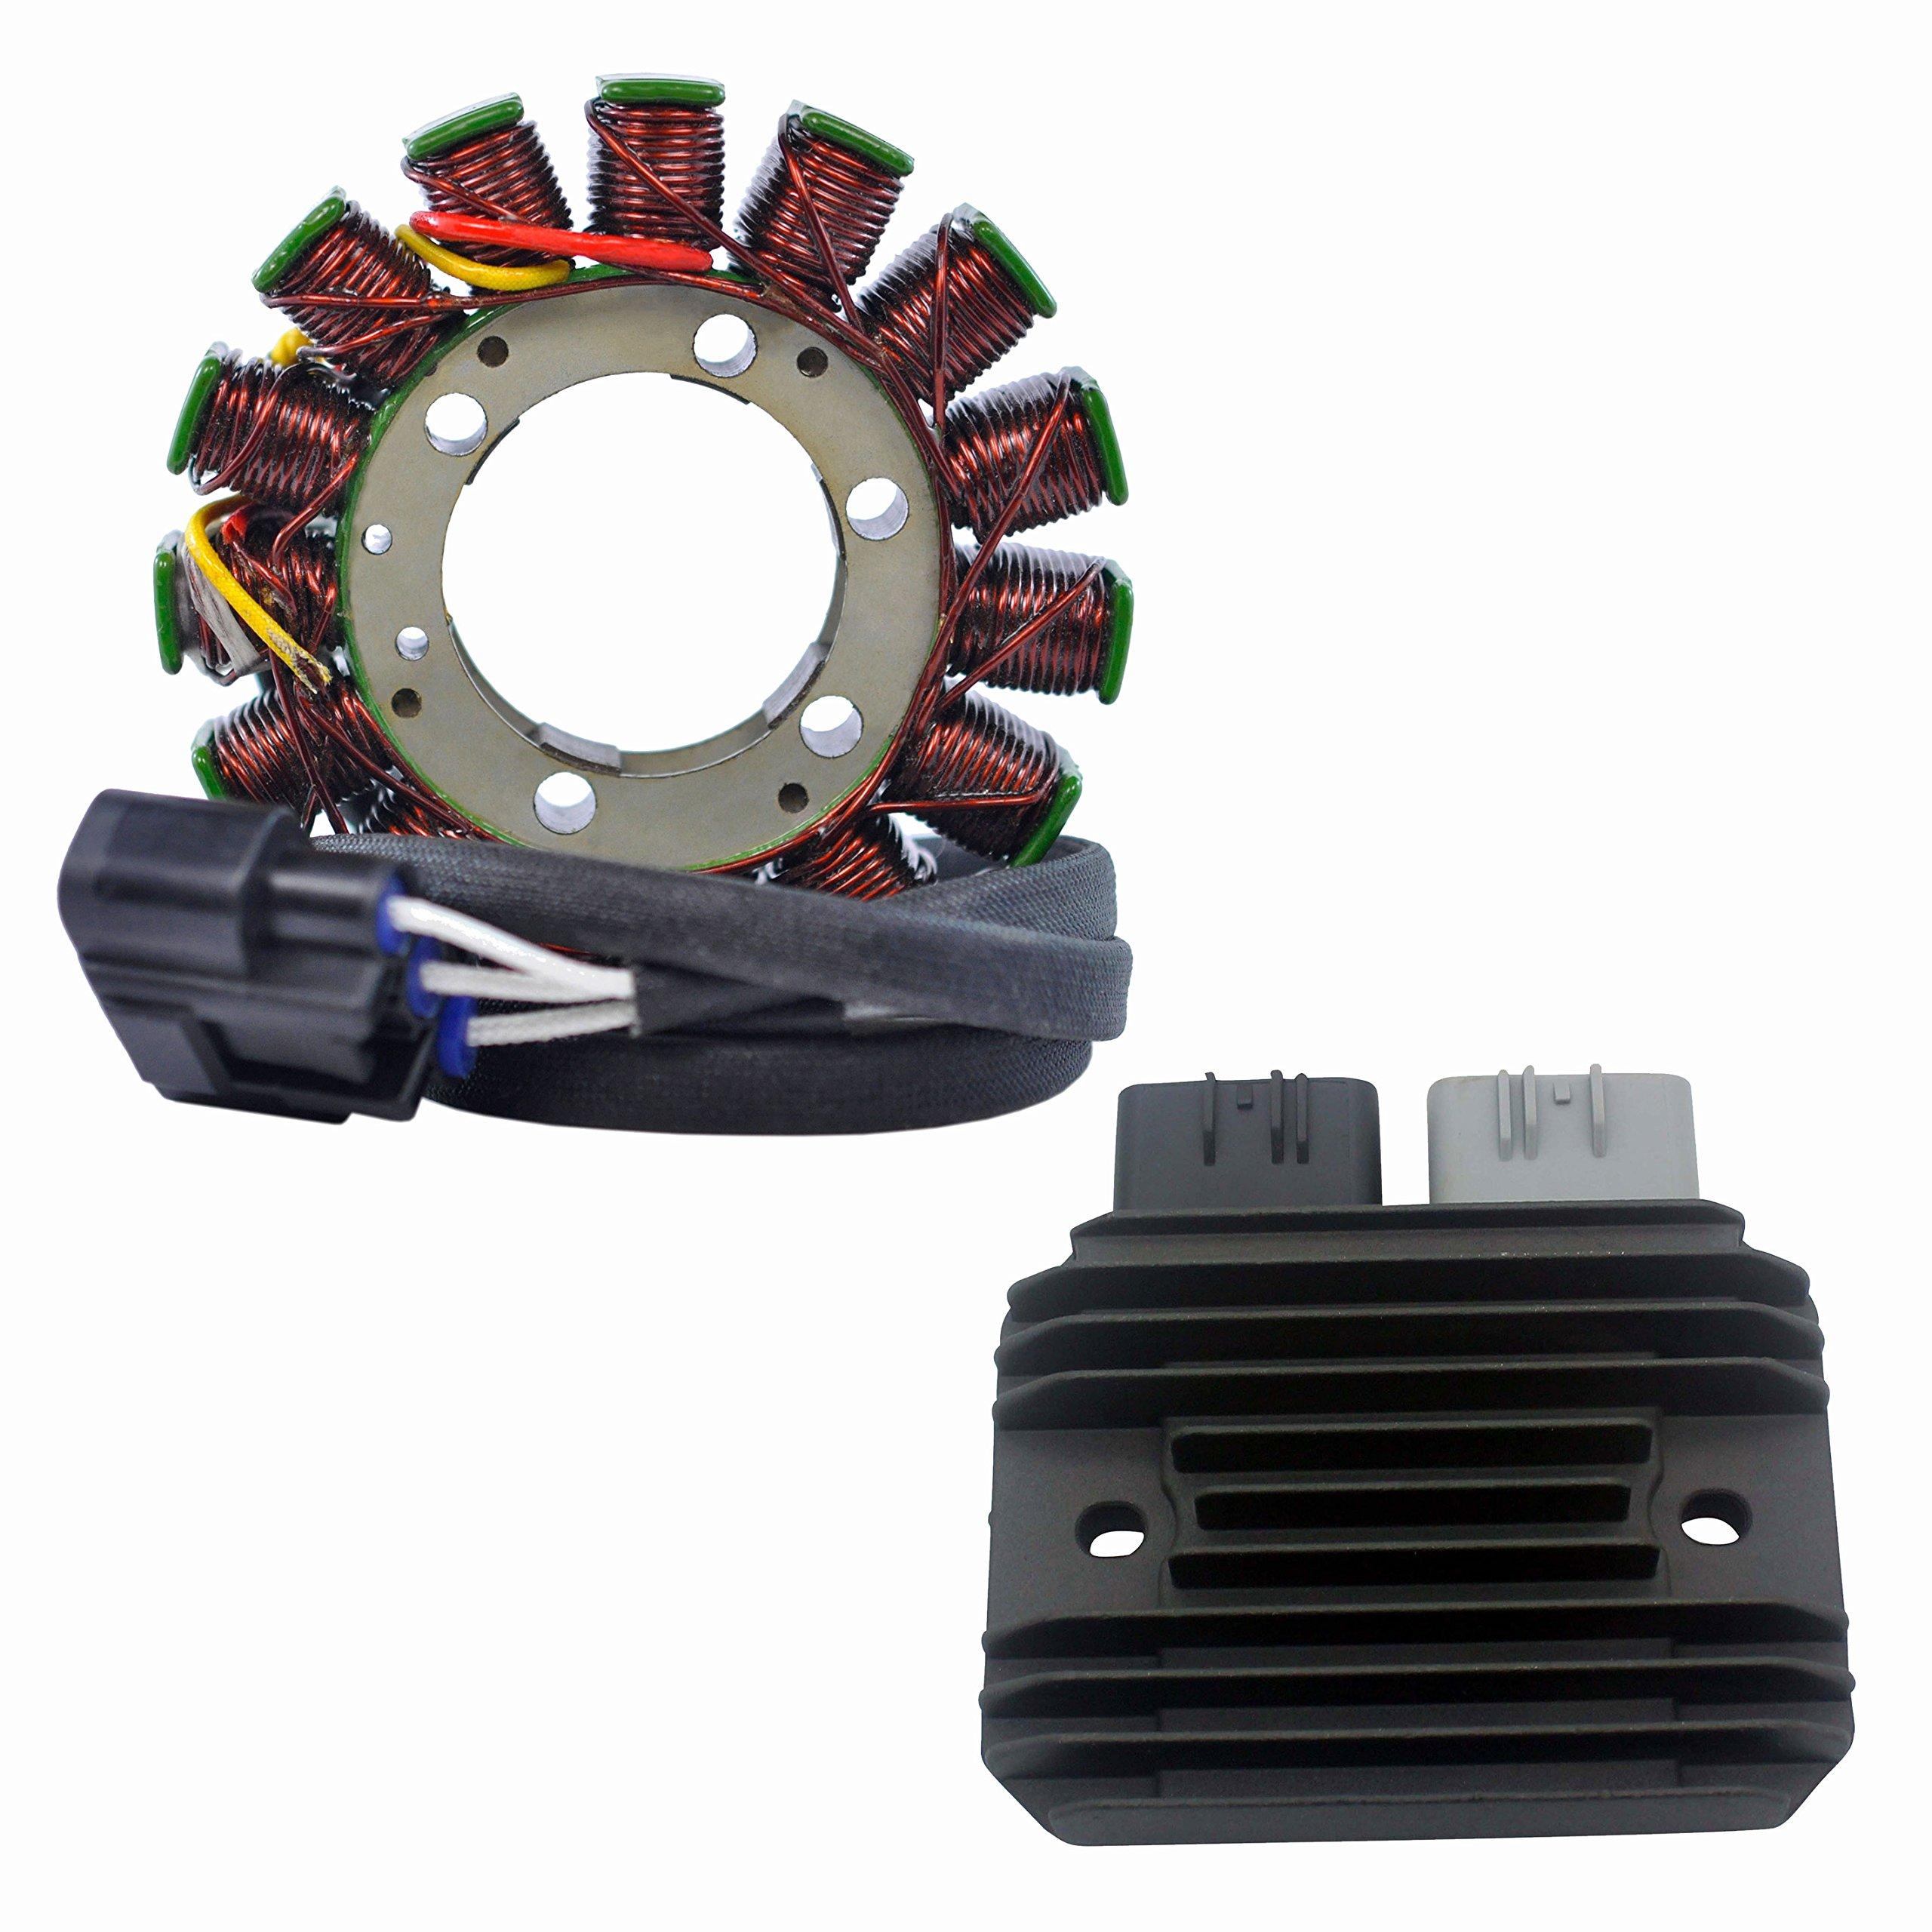 Kit Stator + Mosfet Voltage Regulator Rectifier Fits Kawasaki Ninja ZX-6R 2009-2012 | OEM Repl.# 21003-0083 21066-0028 21066-0731 99999-0377 by RaceTech Electric